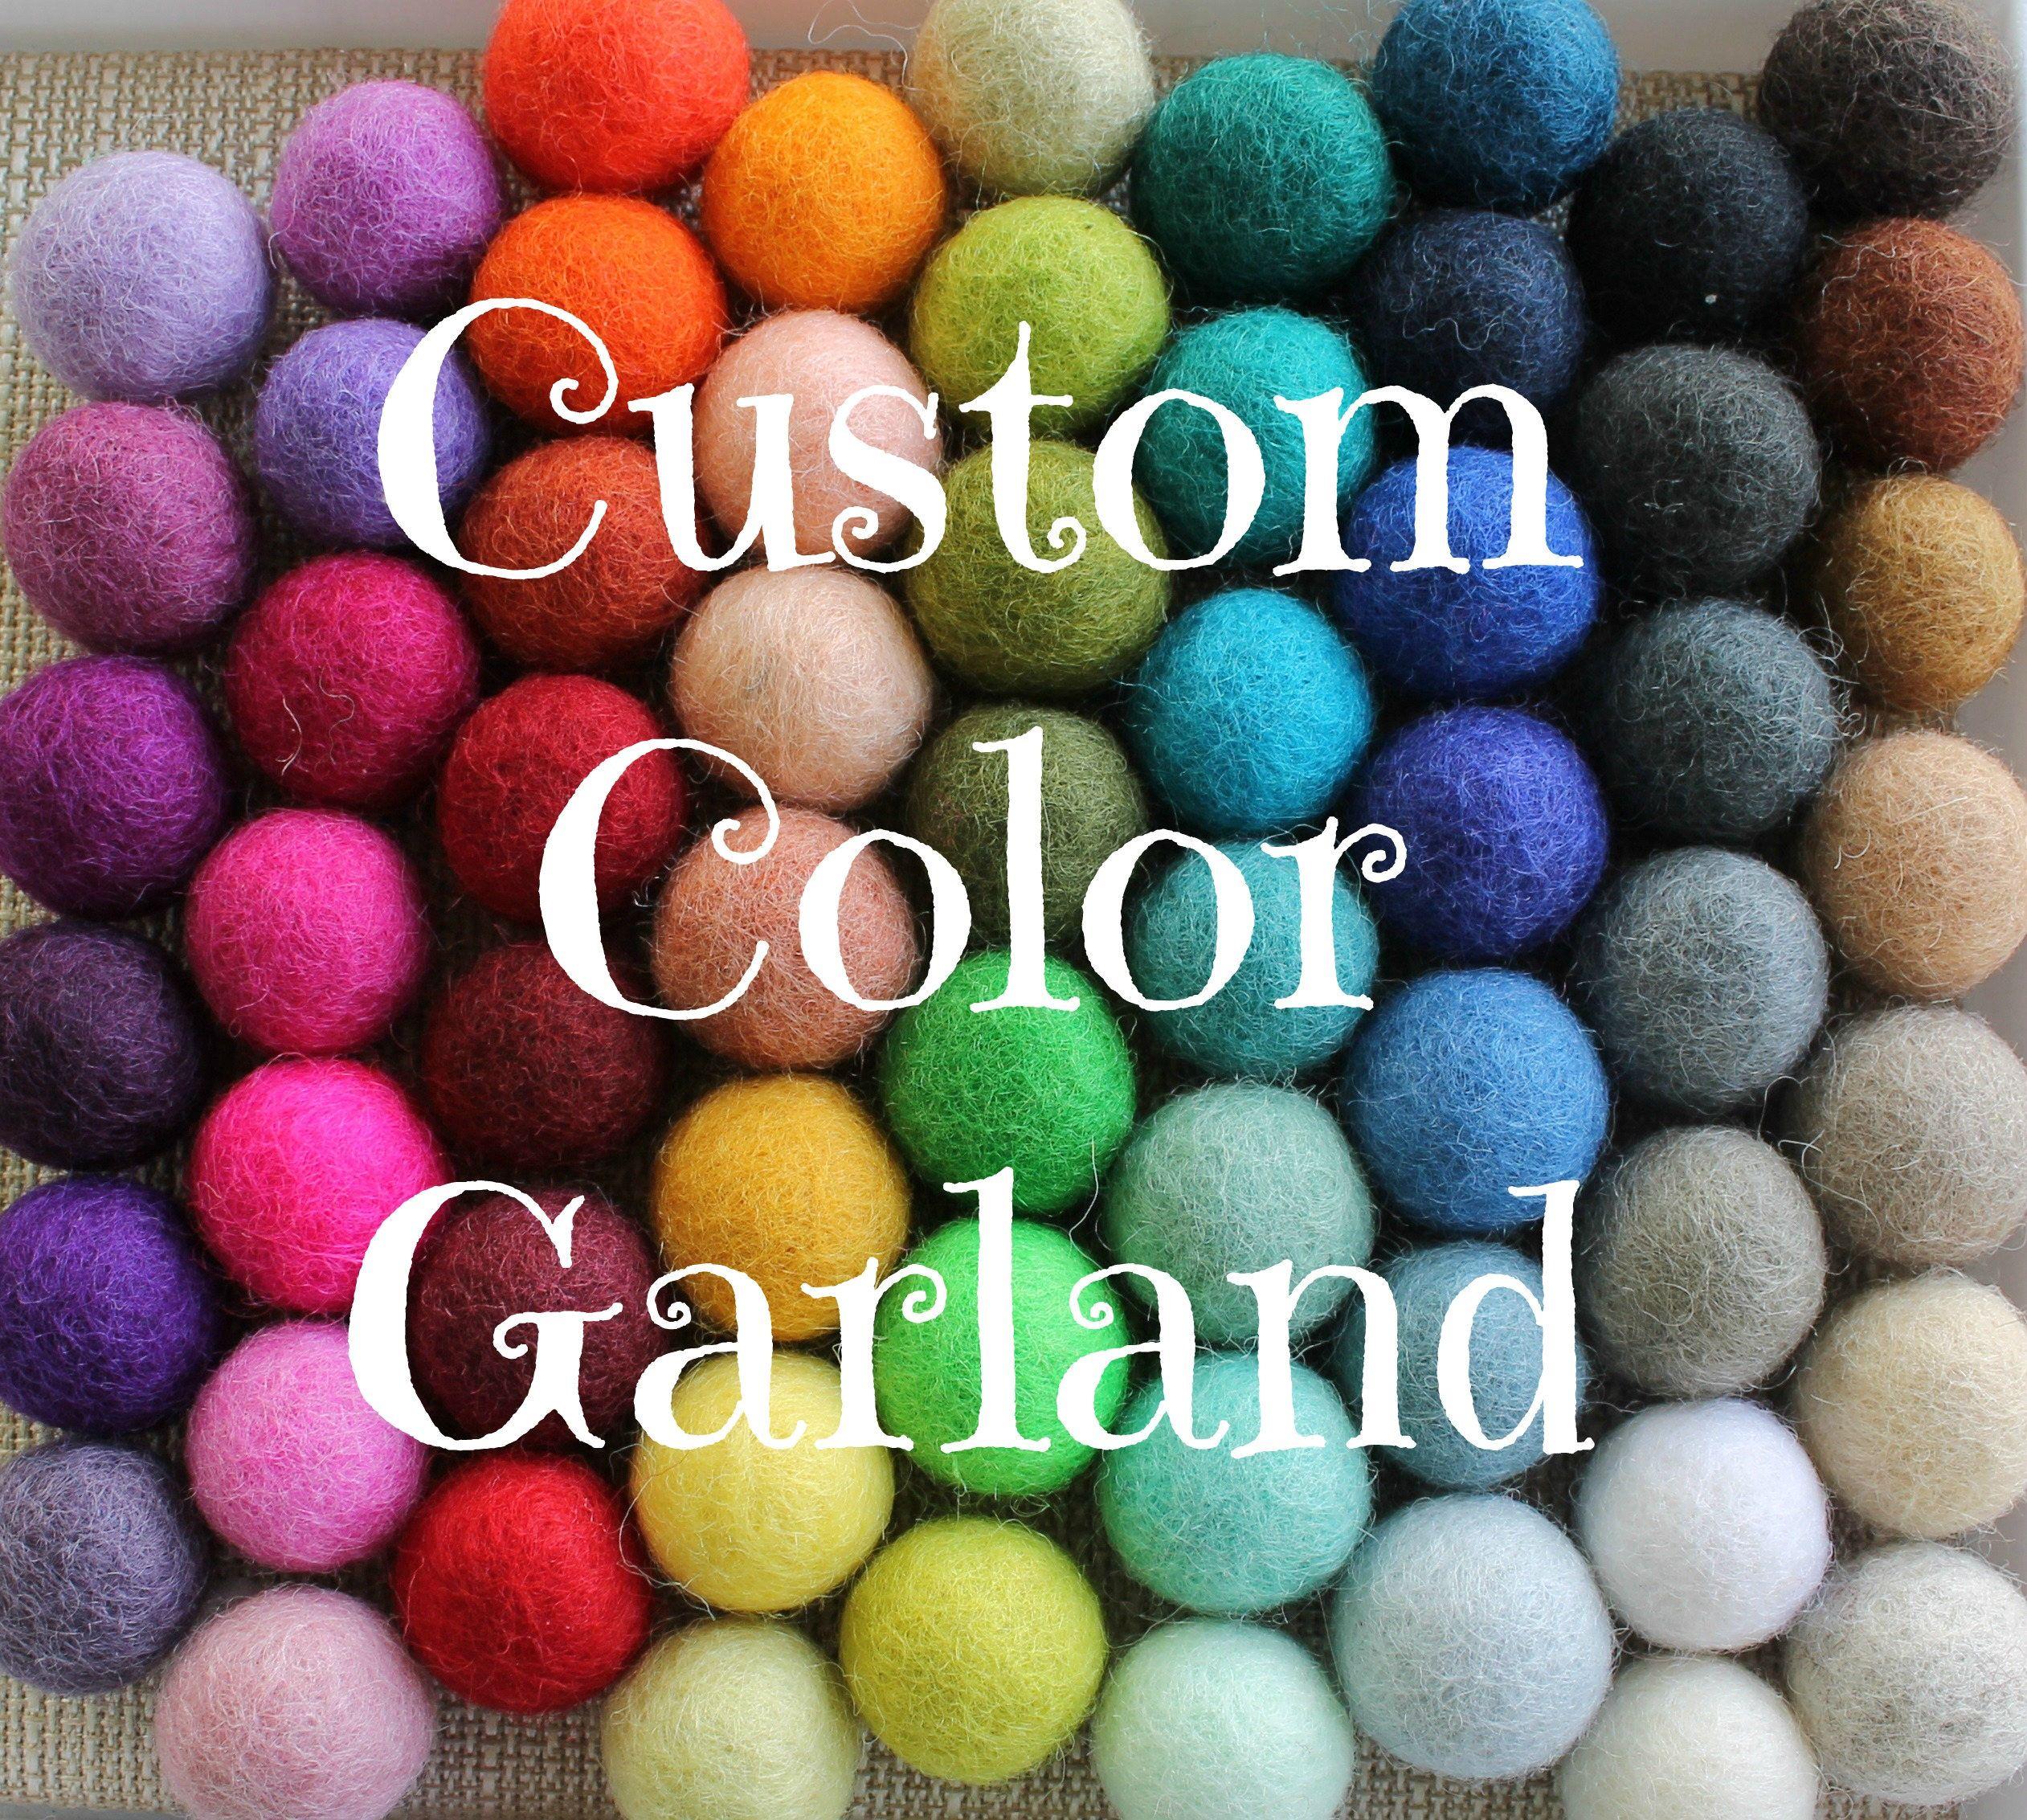 Custom Pom Pom Garland Design Your Own Felt Ball Garland